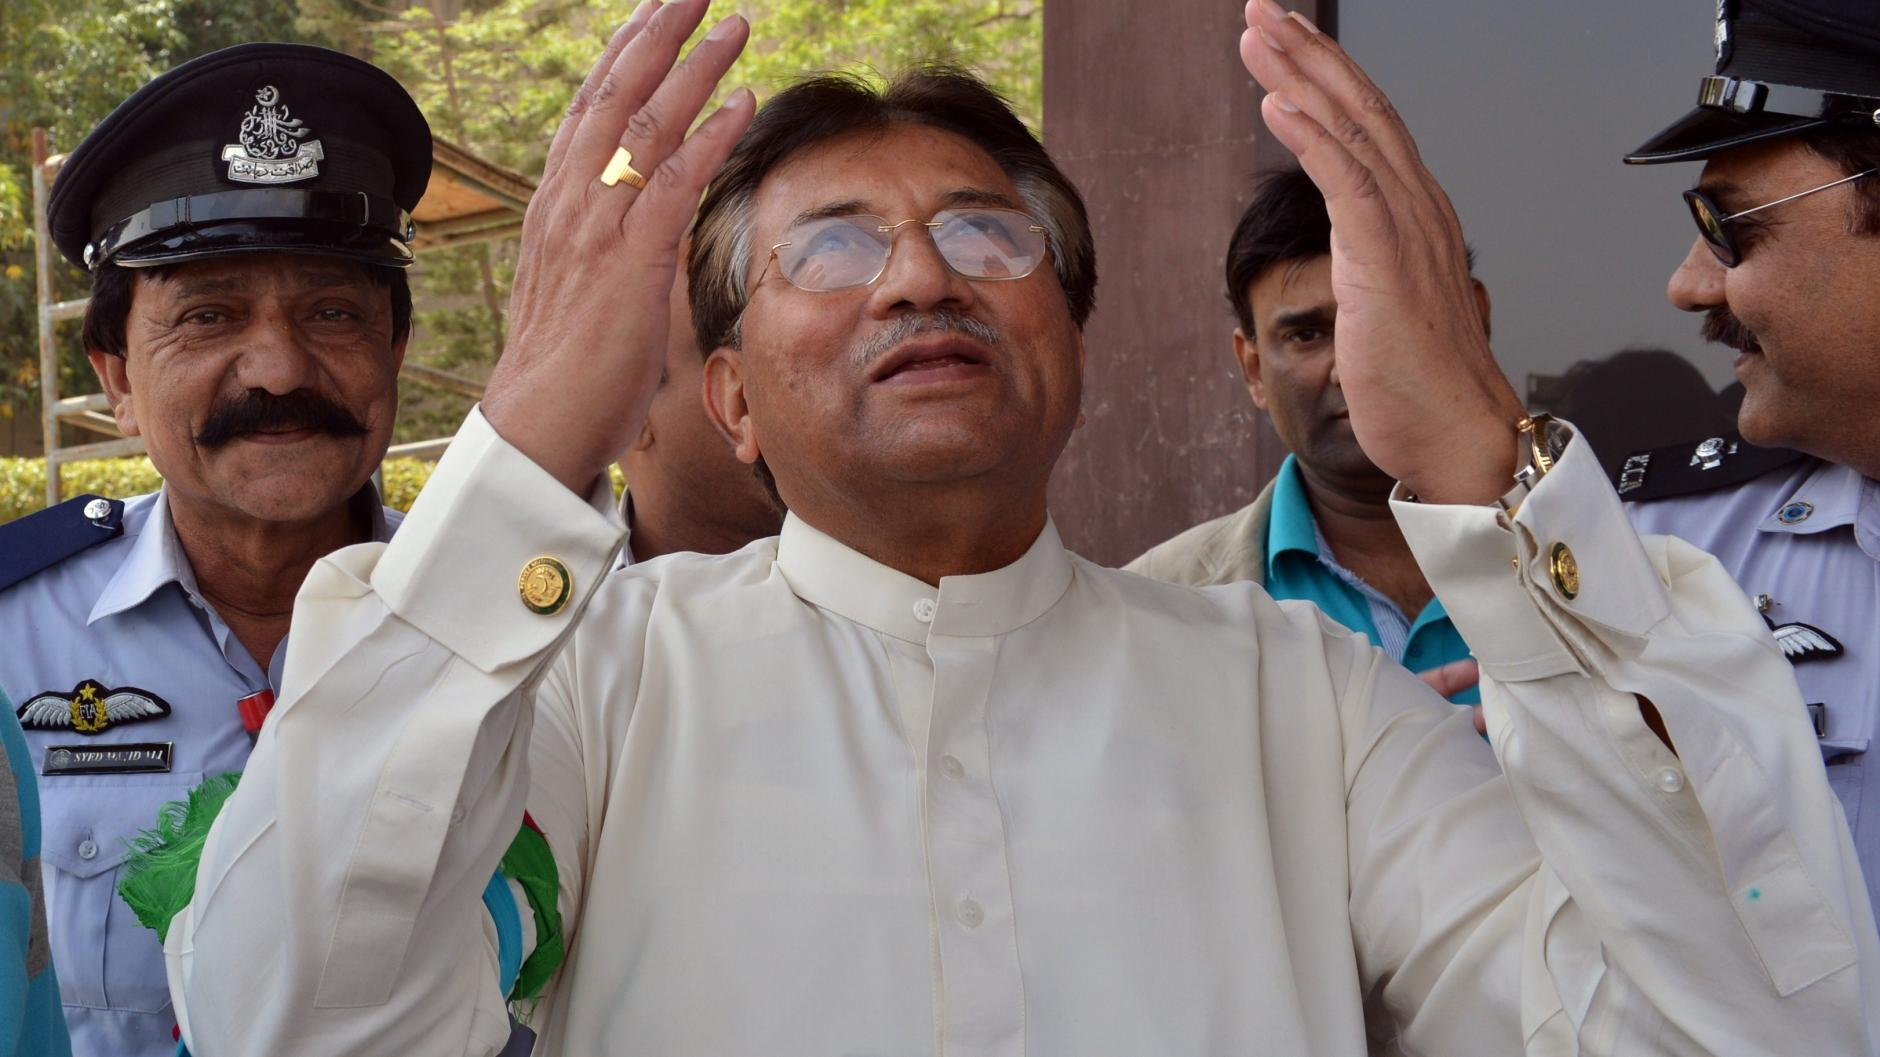 Comback des Ex-Diktators: Exil und zurück: Musharraf ist